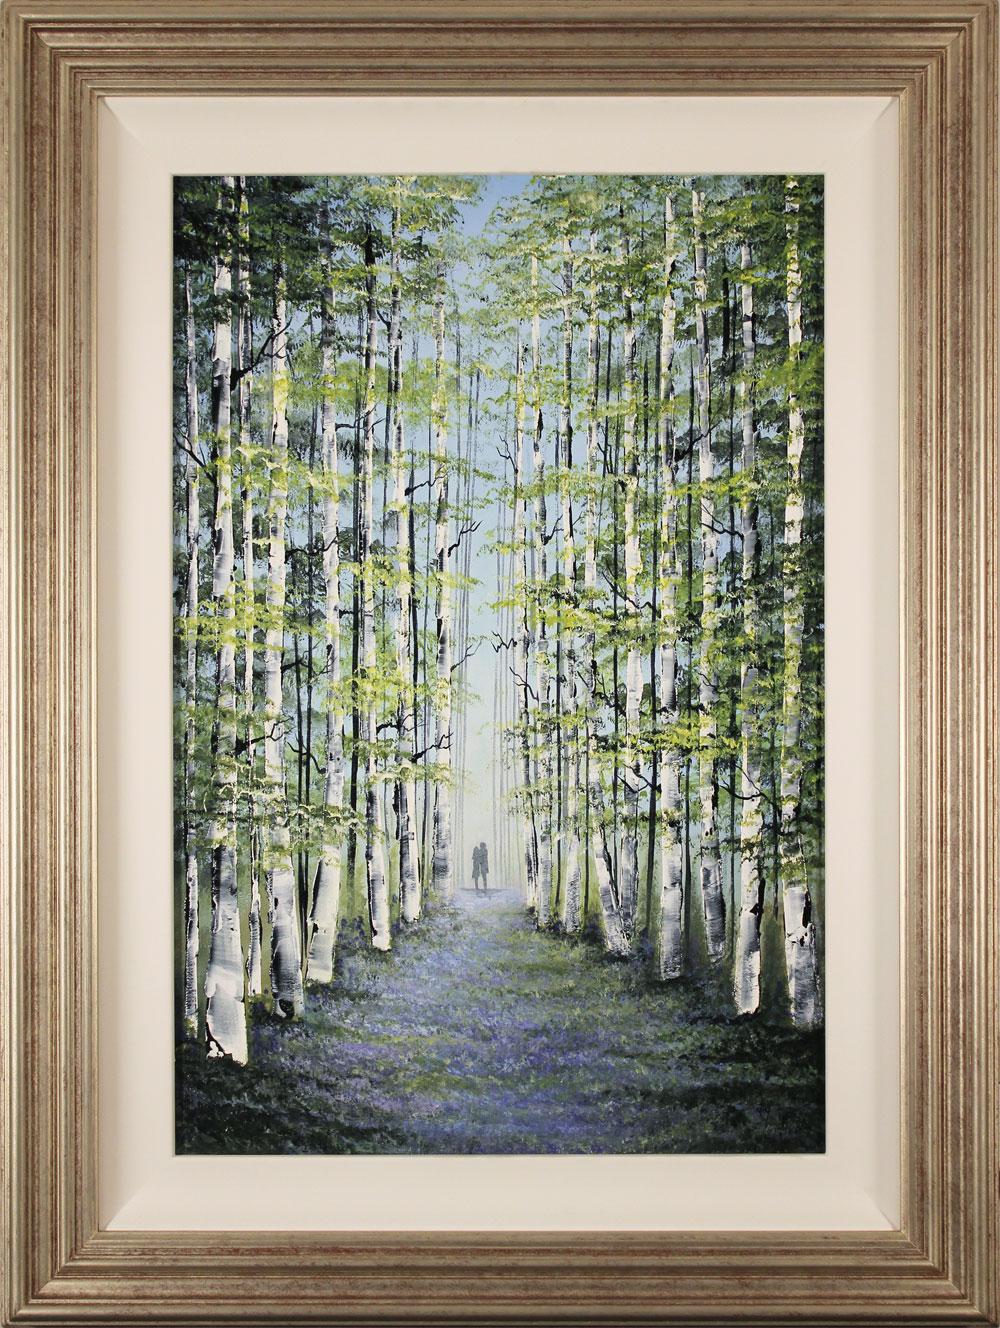 Jay Nottingham, Original oil painting on panel, Woodland Wander. Click to enlarge